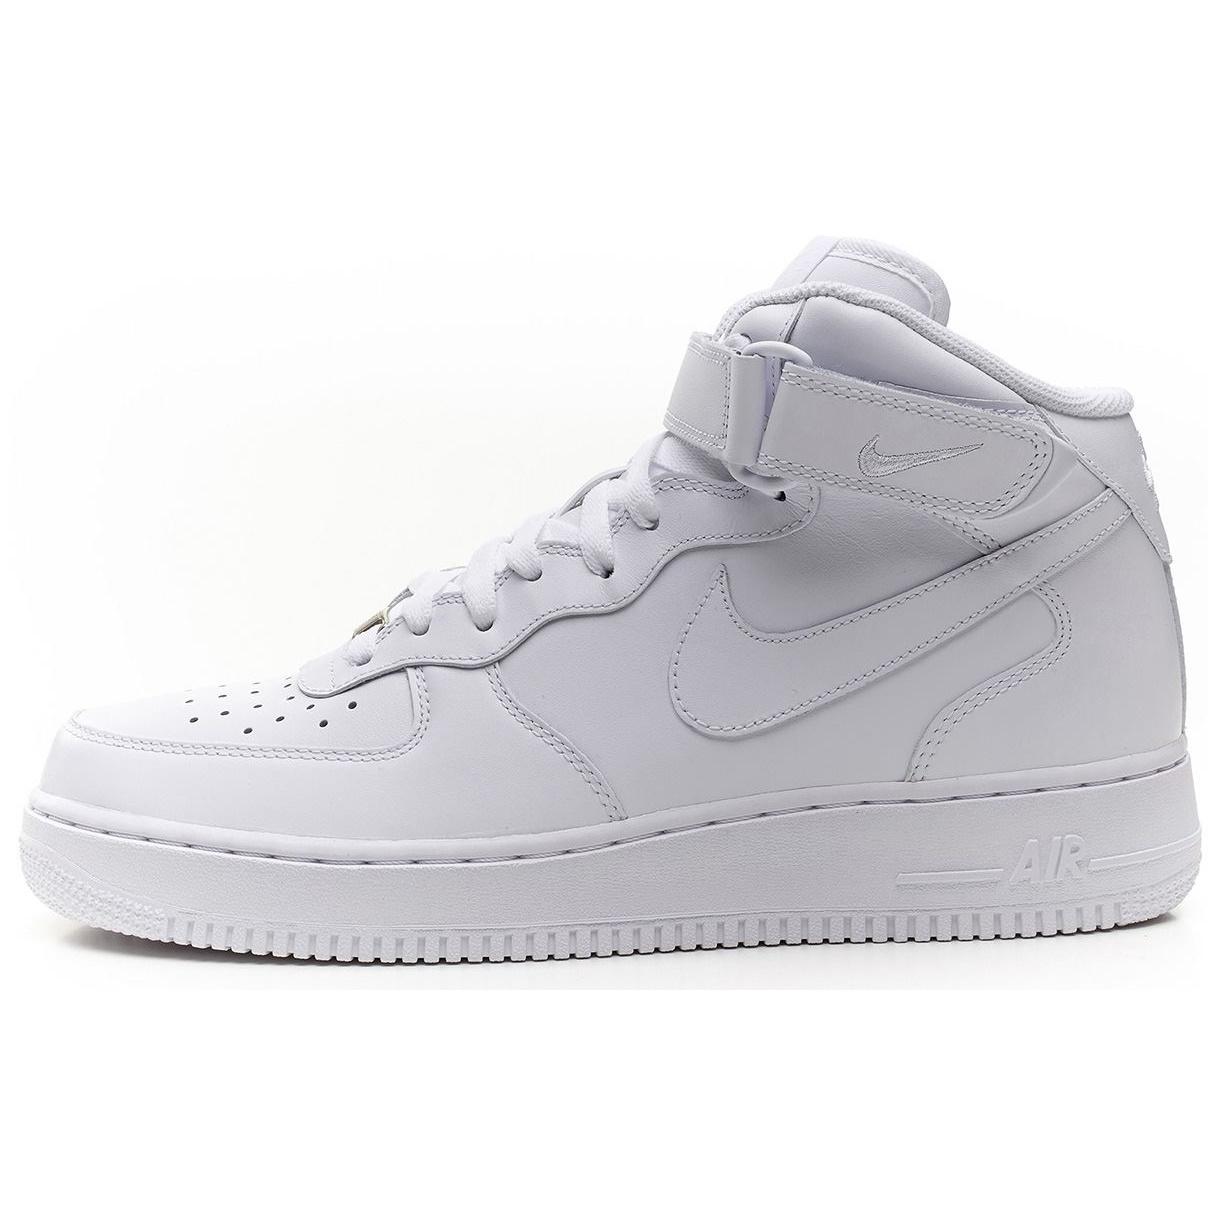 air force 1 blancas altas